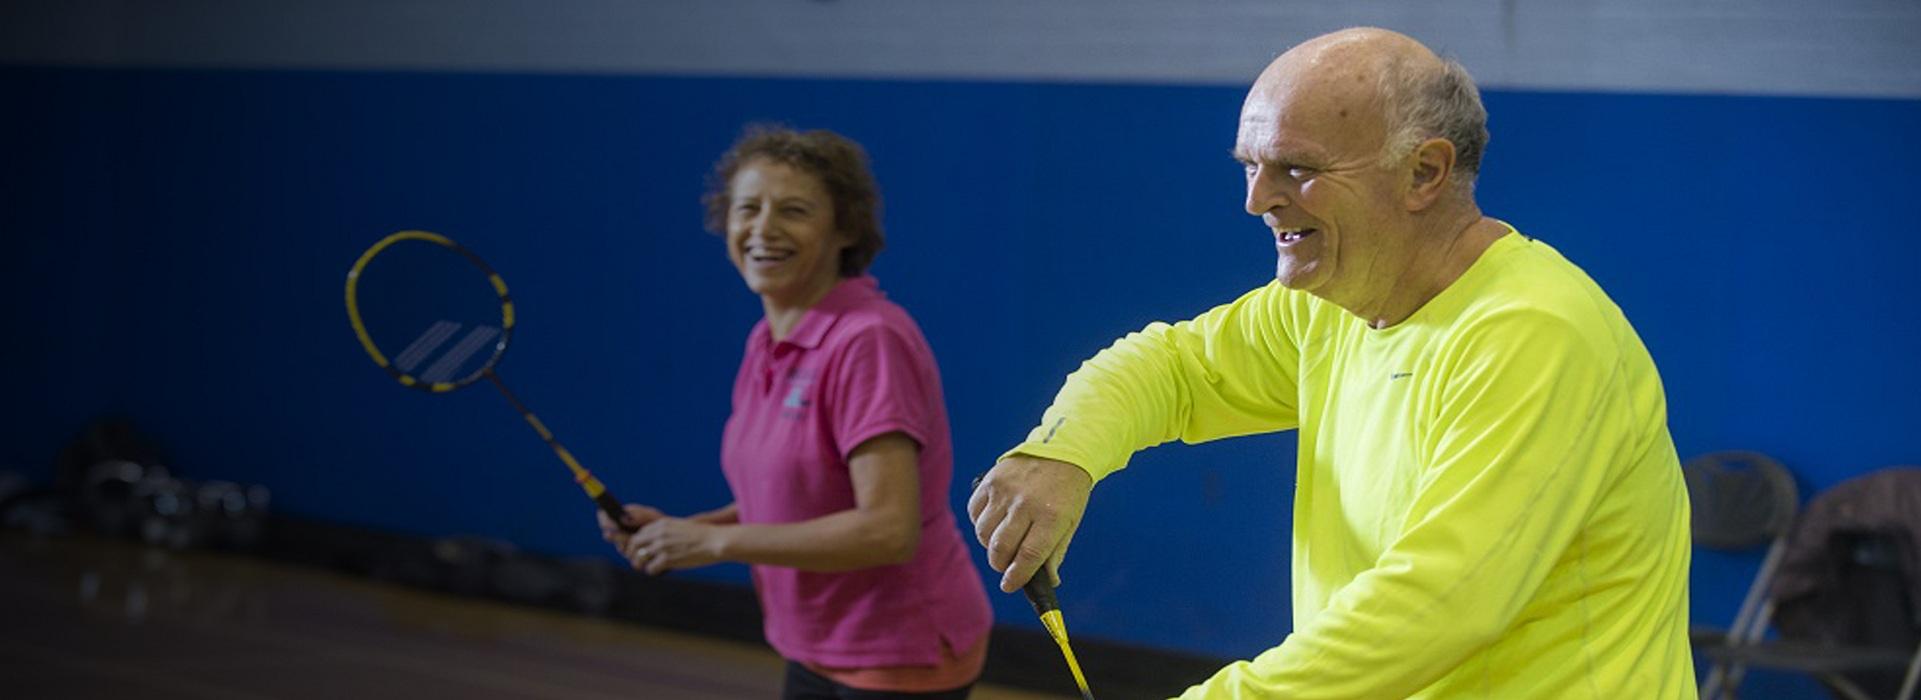 Shree Sports -Badminton